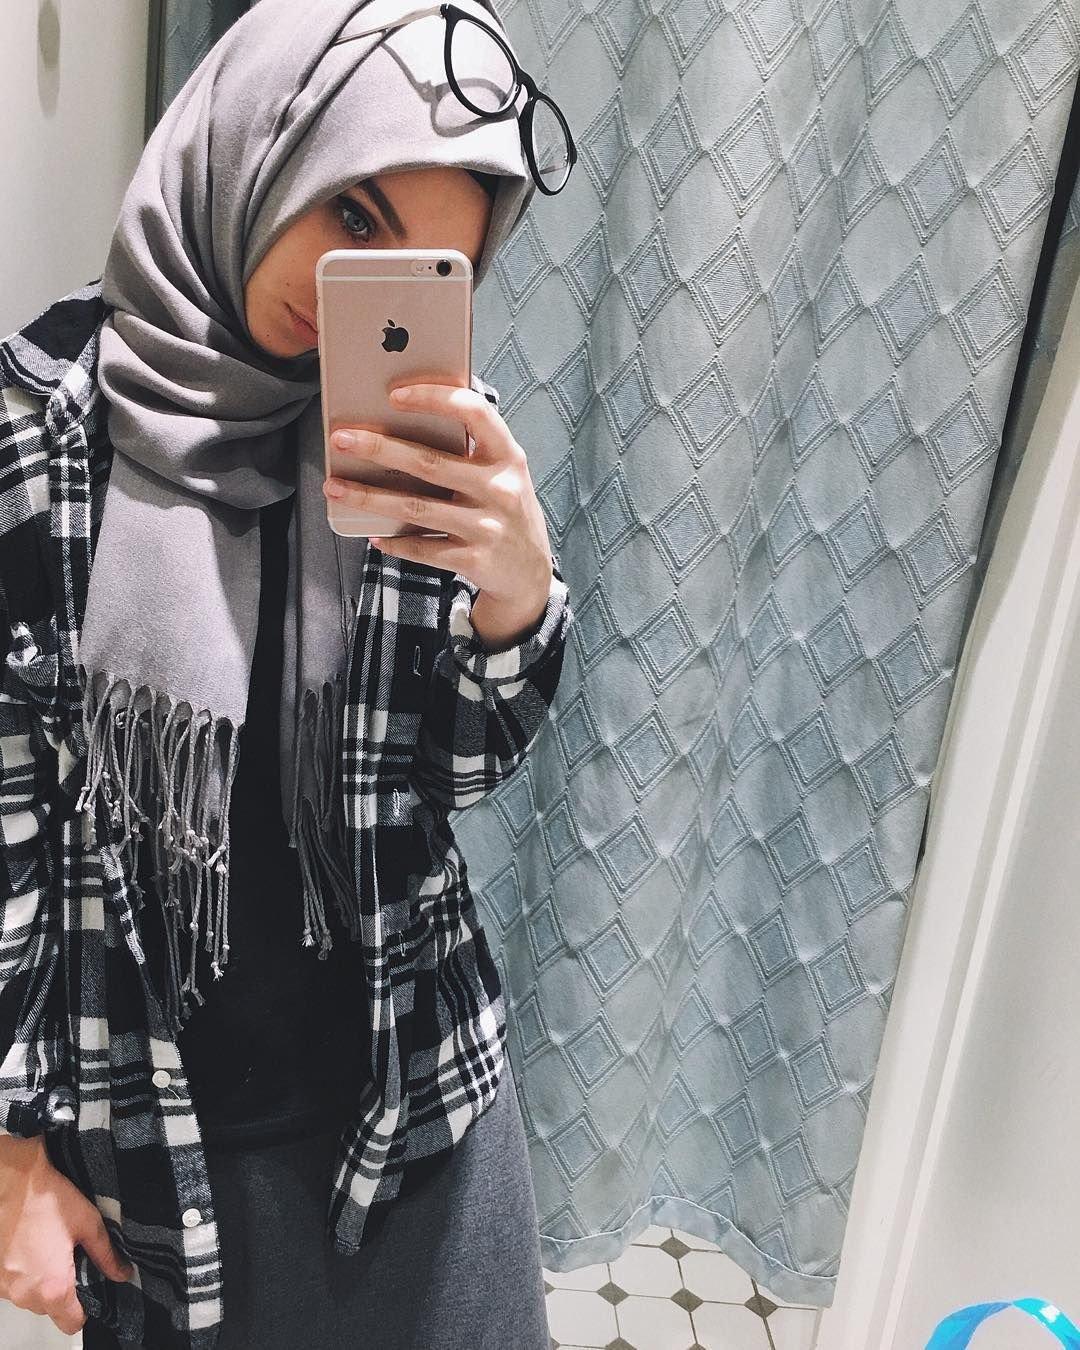 Фотки мусульманок без лица